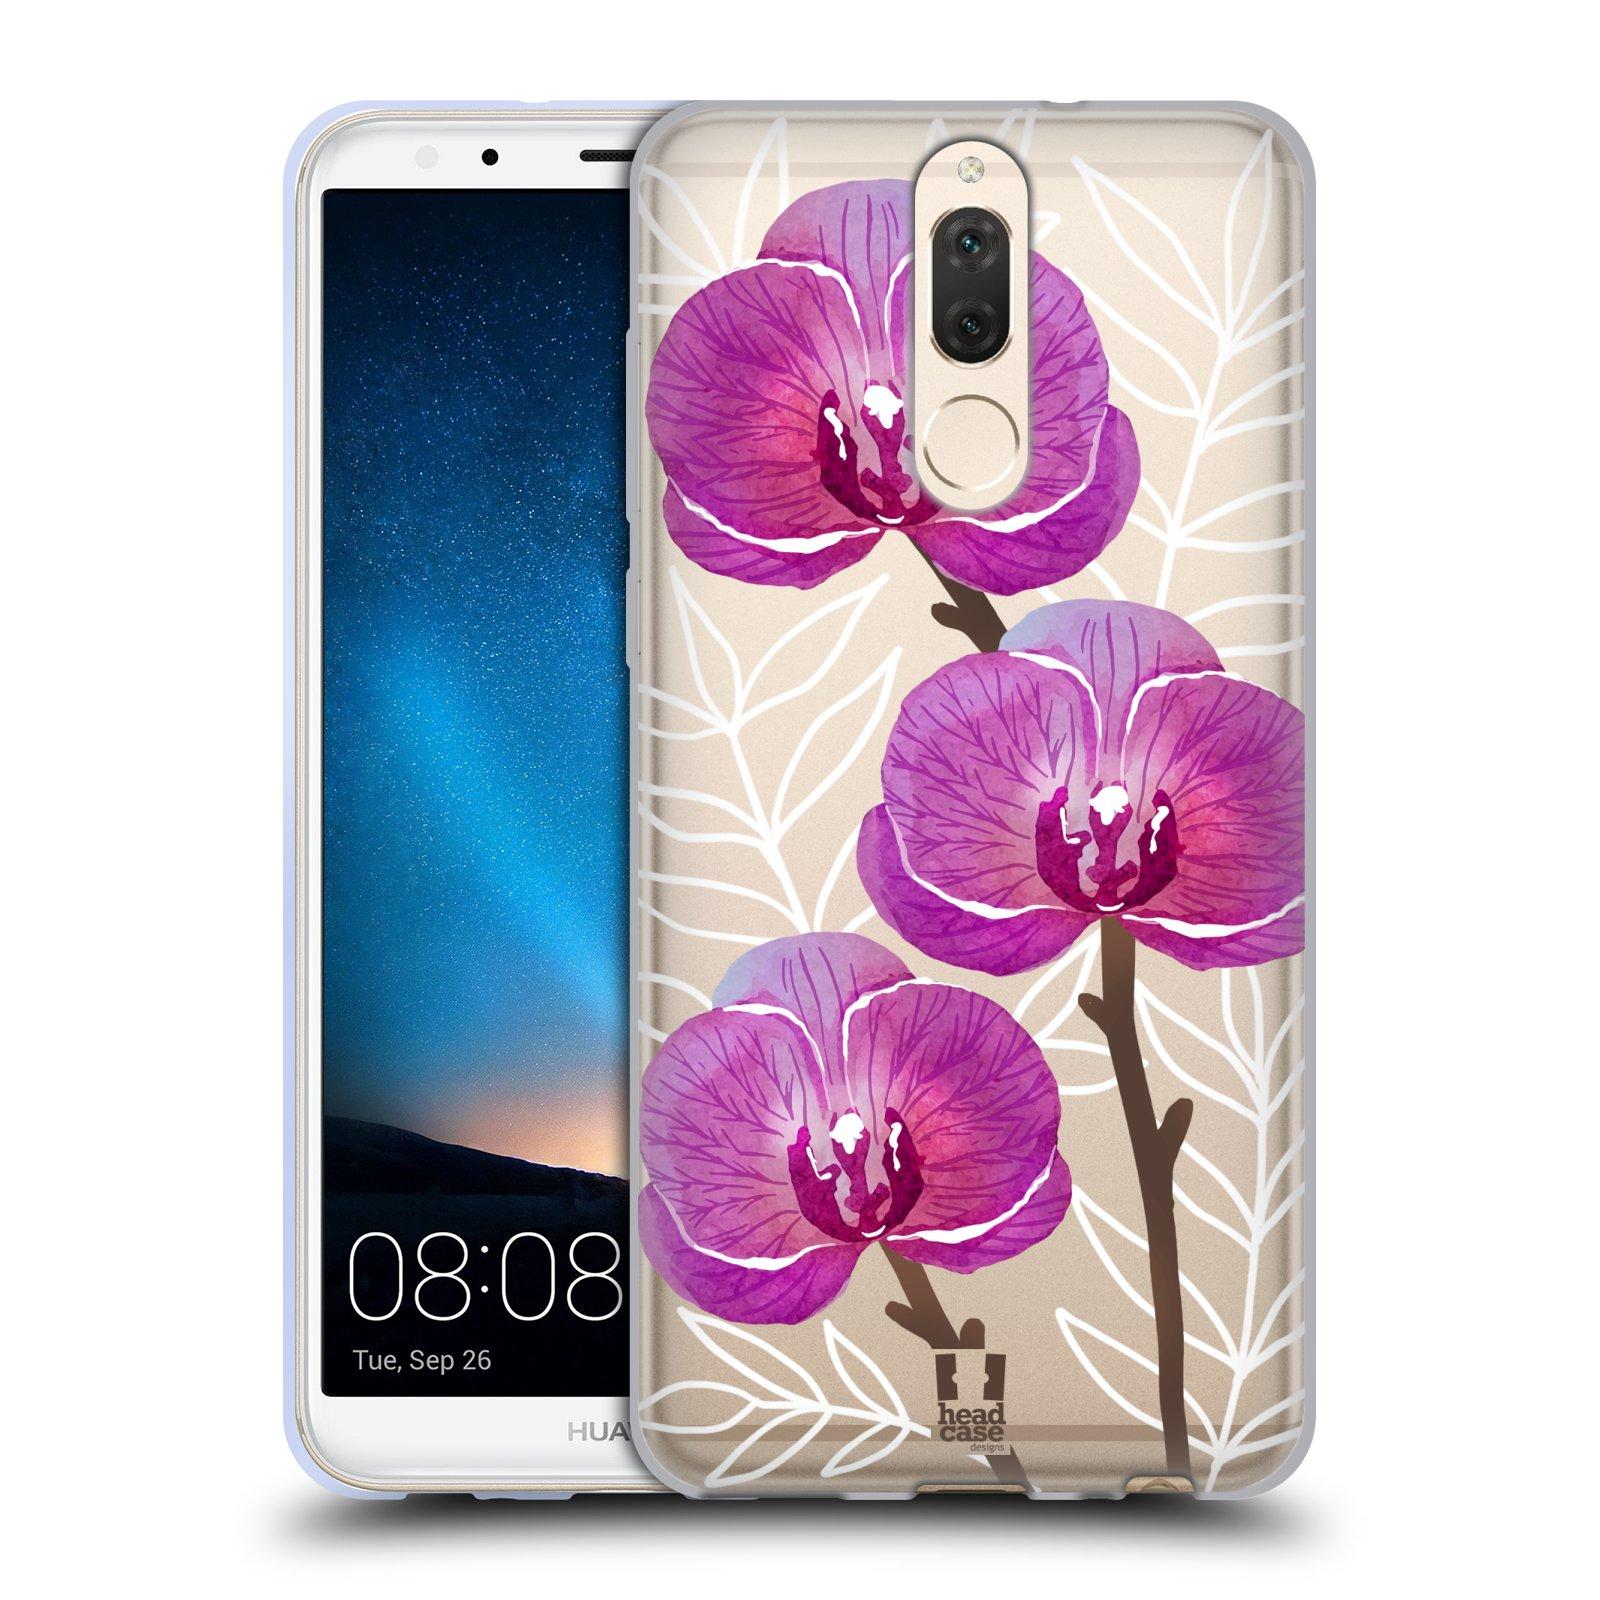 Silikonové pouzdro na mobil Huawei Mate 10 Lite - Head Case - Hezoučké kvítky - průhledné